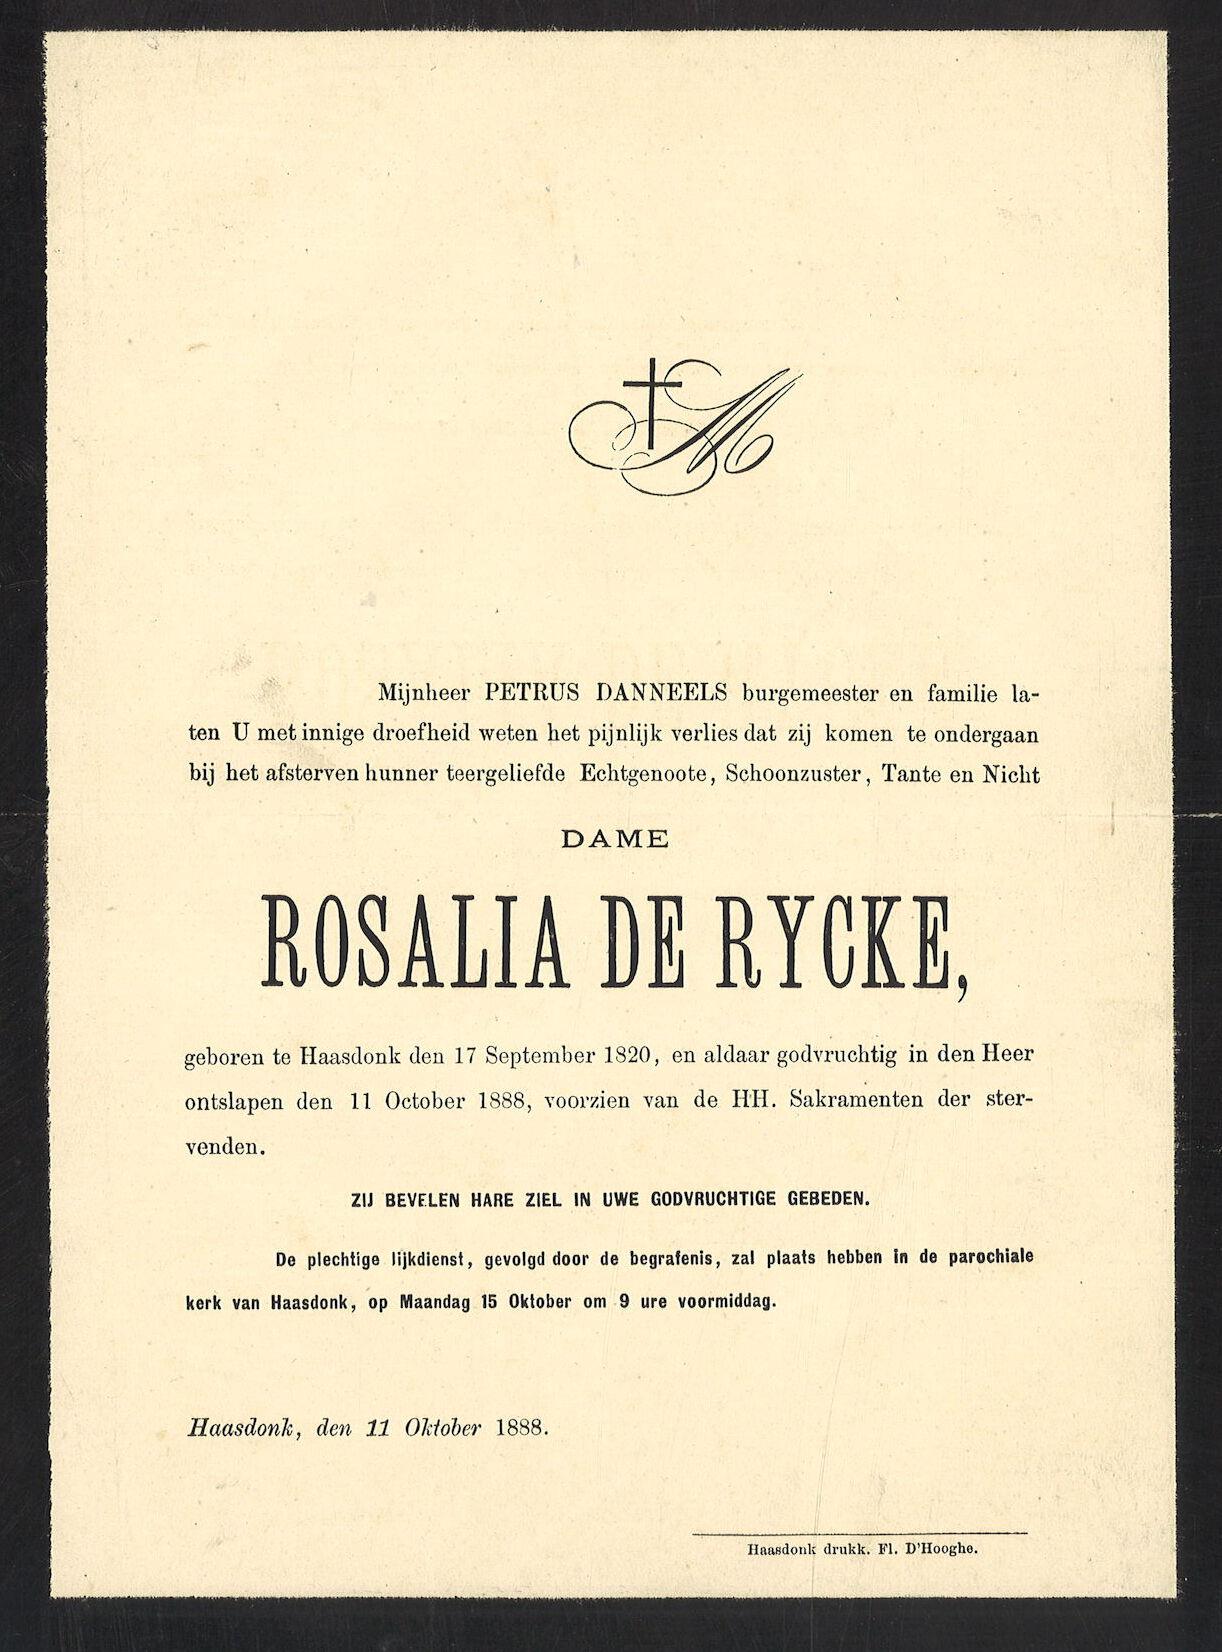 Rosalia De Rycke